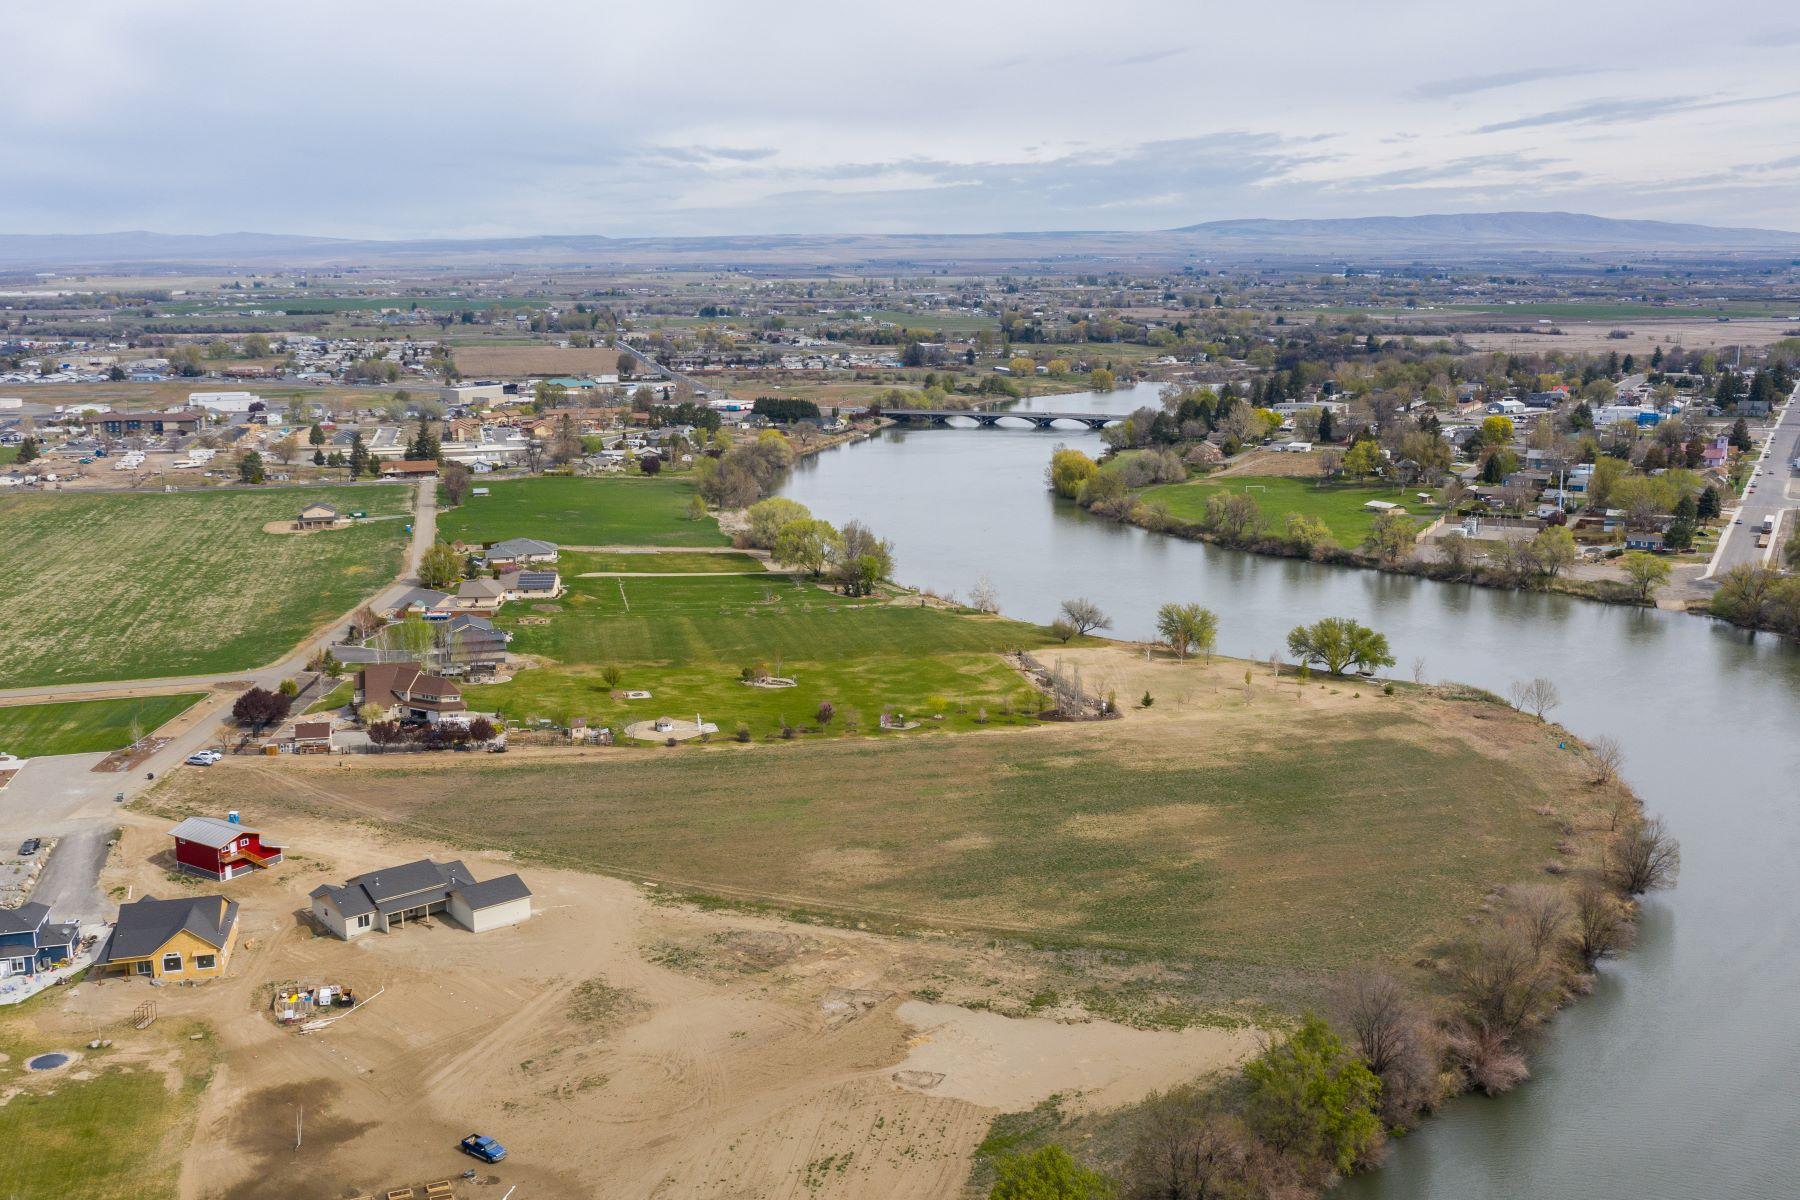 Land for Sale at WOW- 6.5 Acres Riverfront Sub-Dividable 723 SW PR 1366, Prosser, Washington 99350 United States